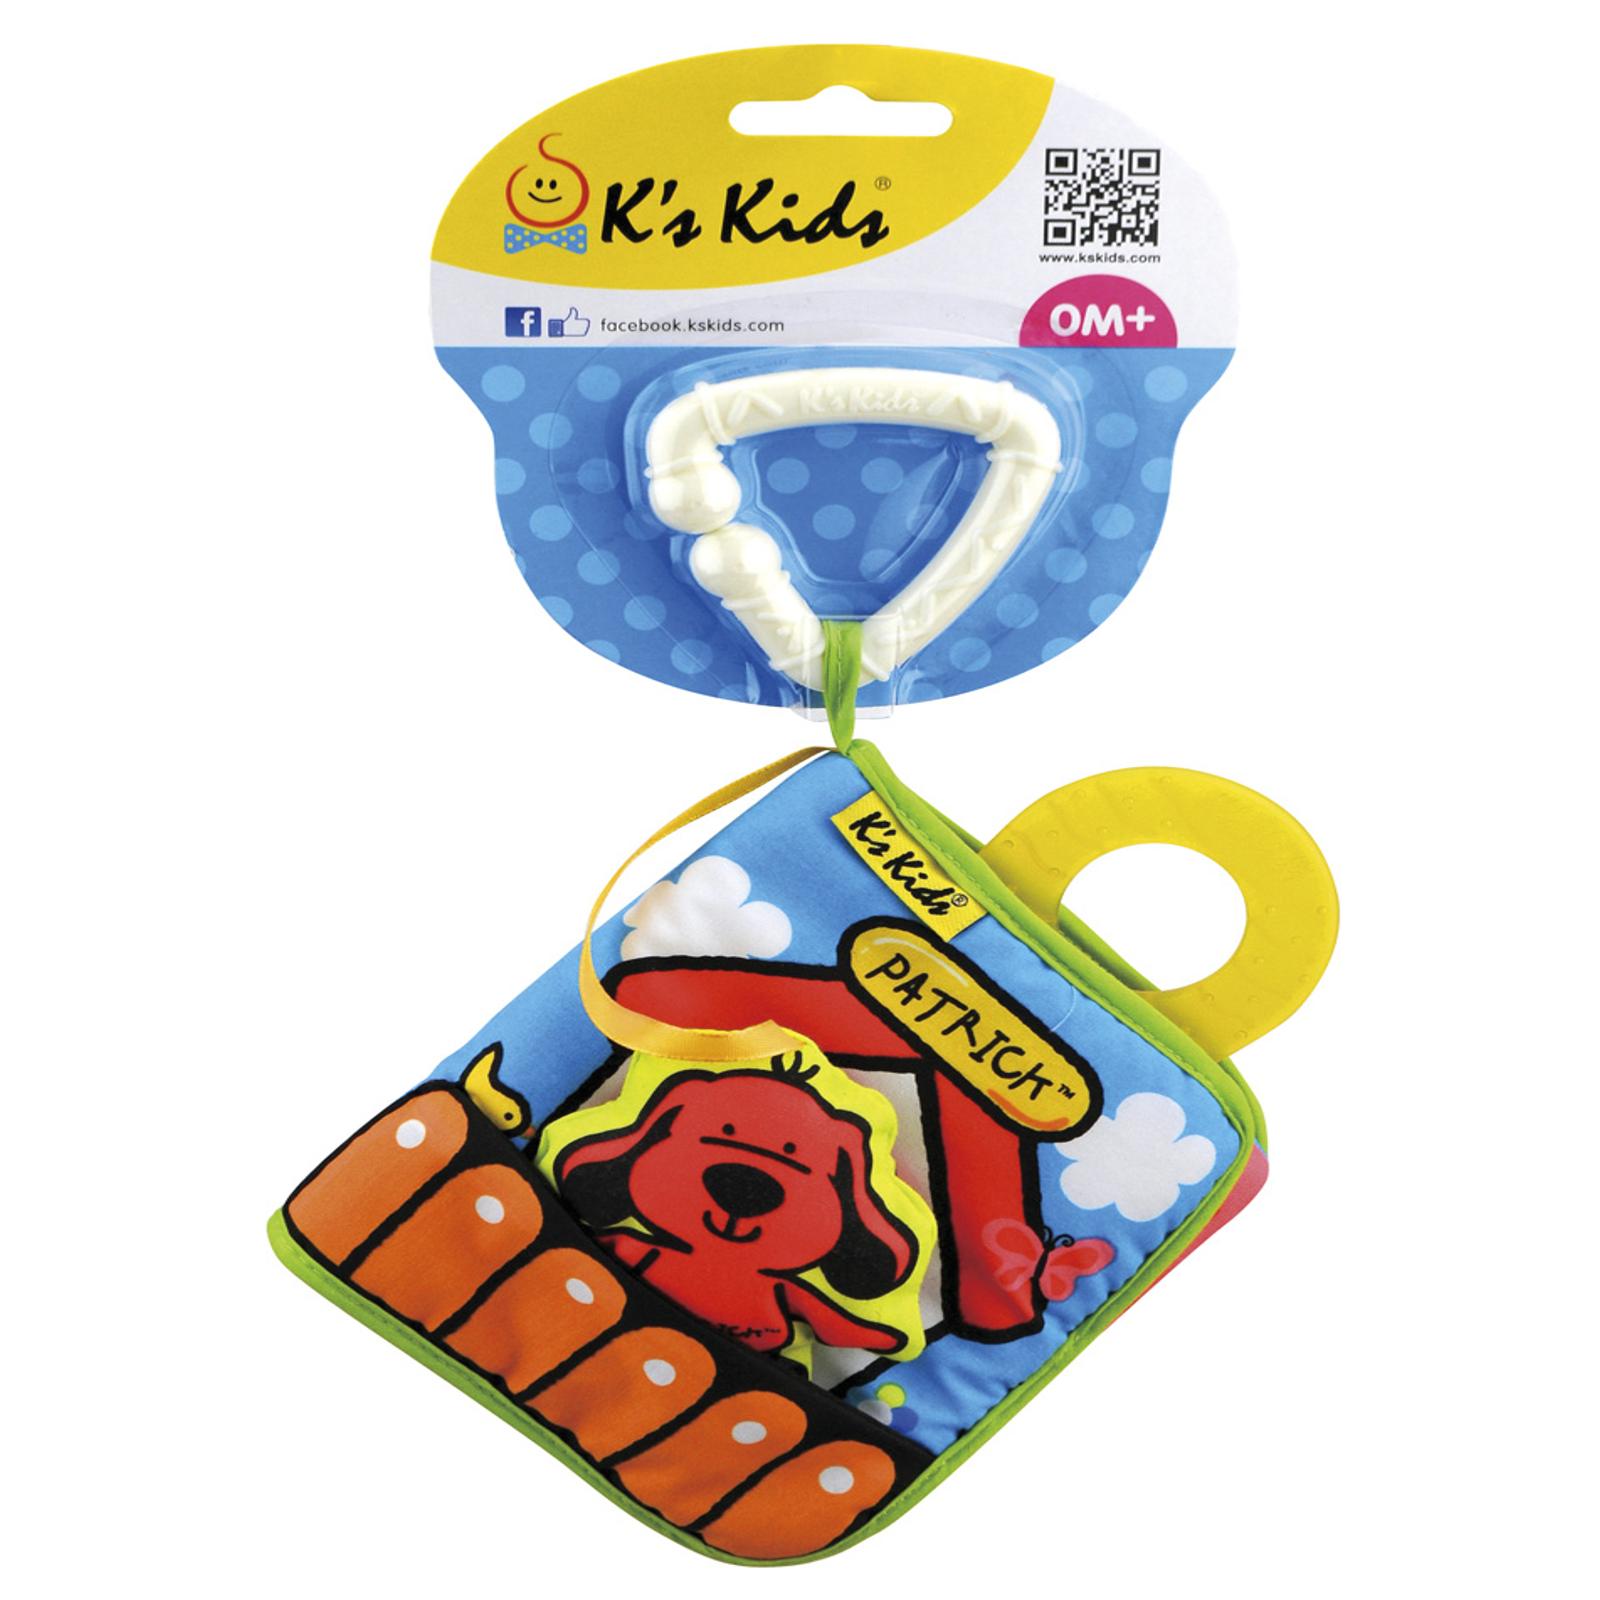 ����������� ������� K's Kids ������ ������ � 6 ���.